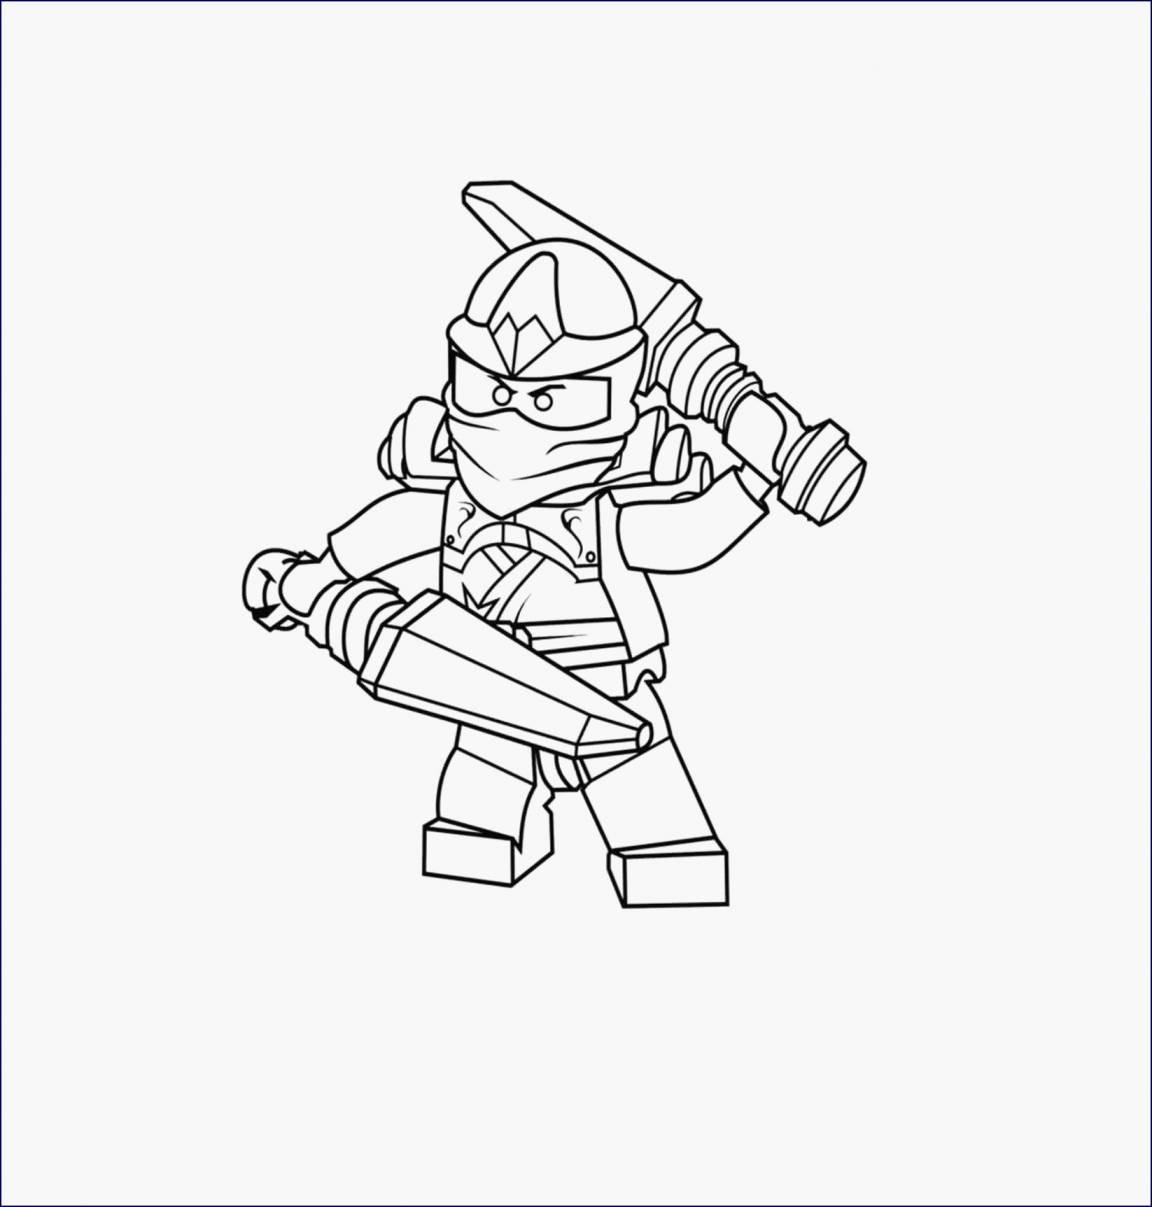 ausmalbilder ninjago luftpiraten inspirierend ninjago lego